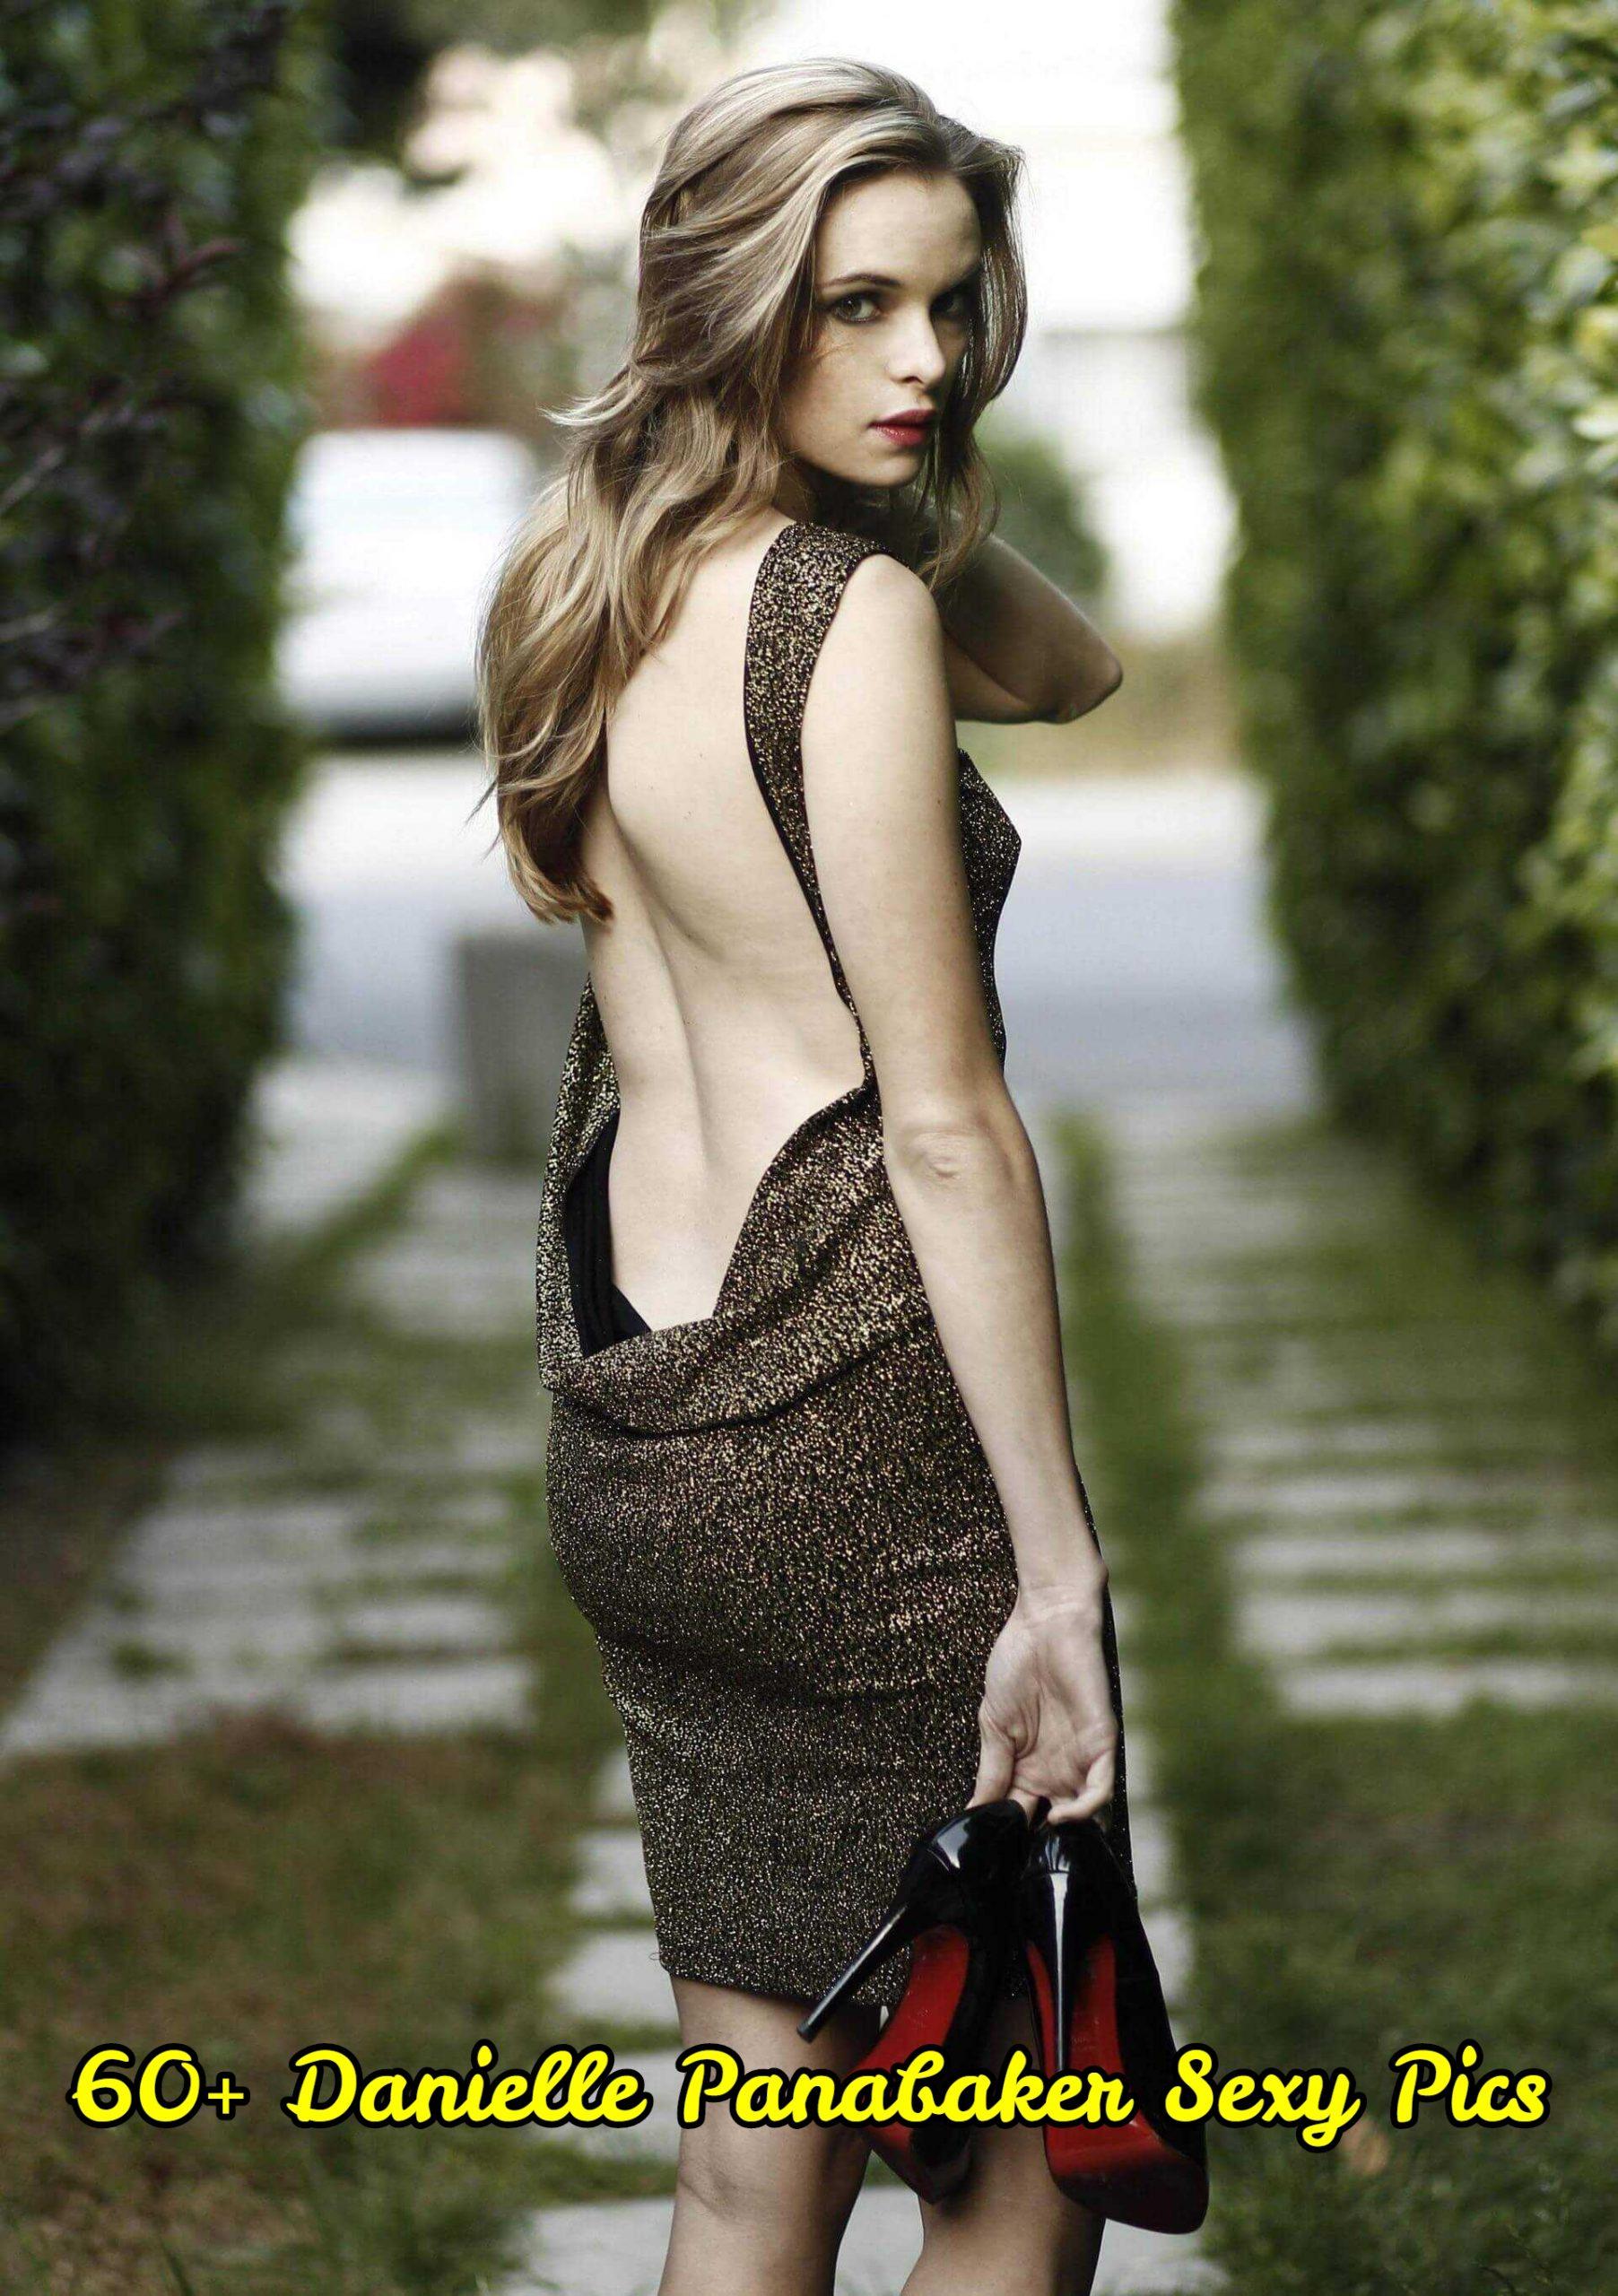 Danielle Panabaker backless